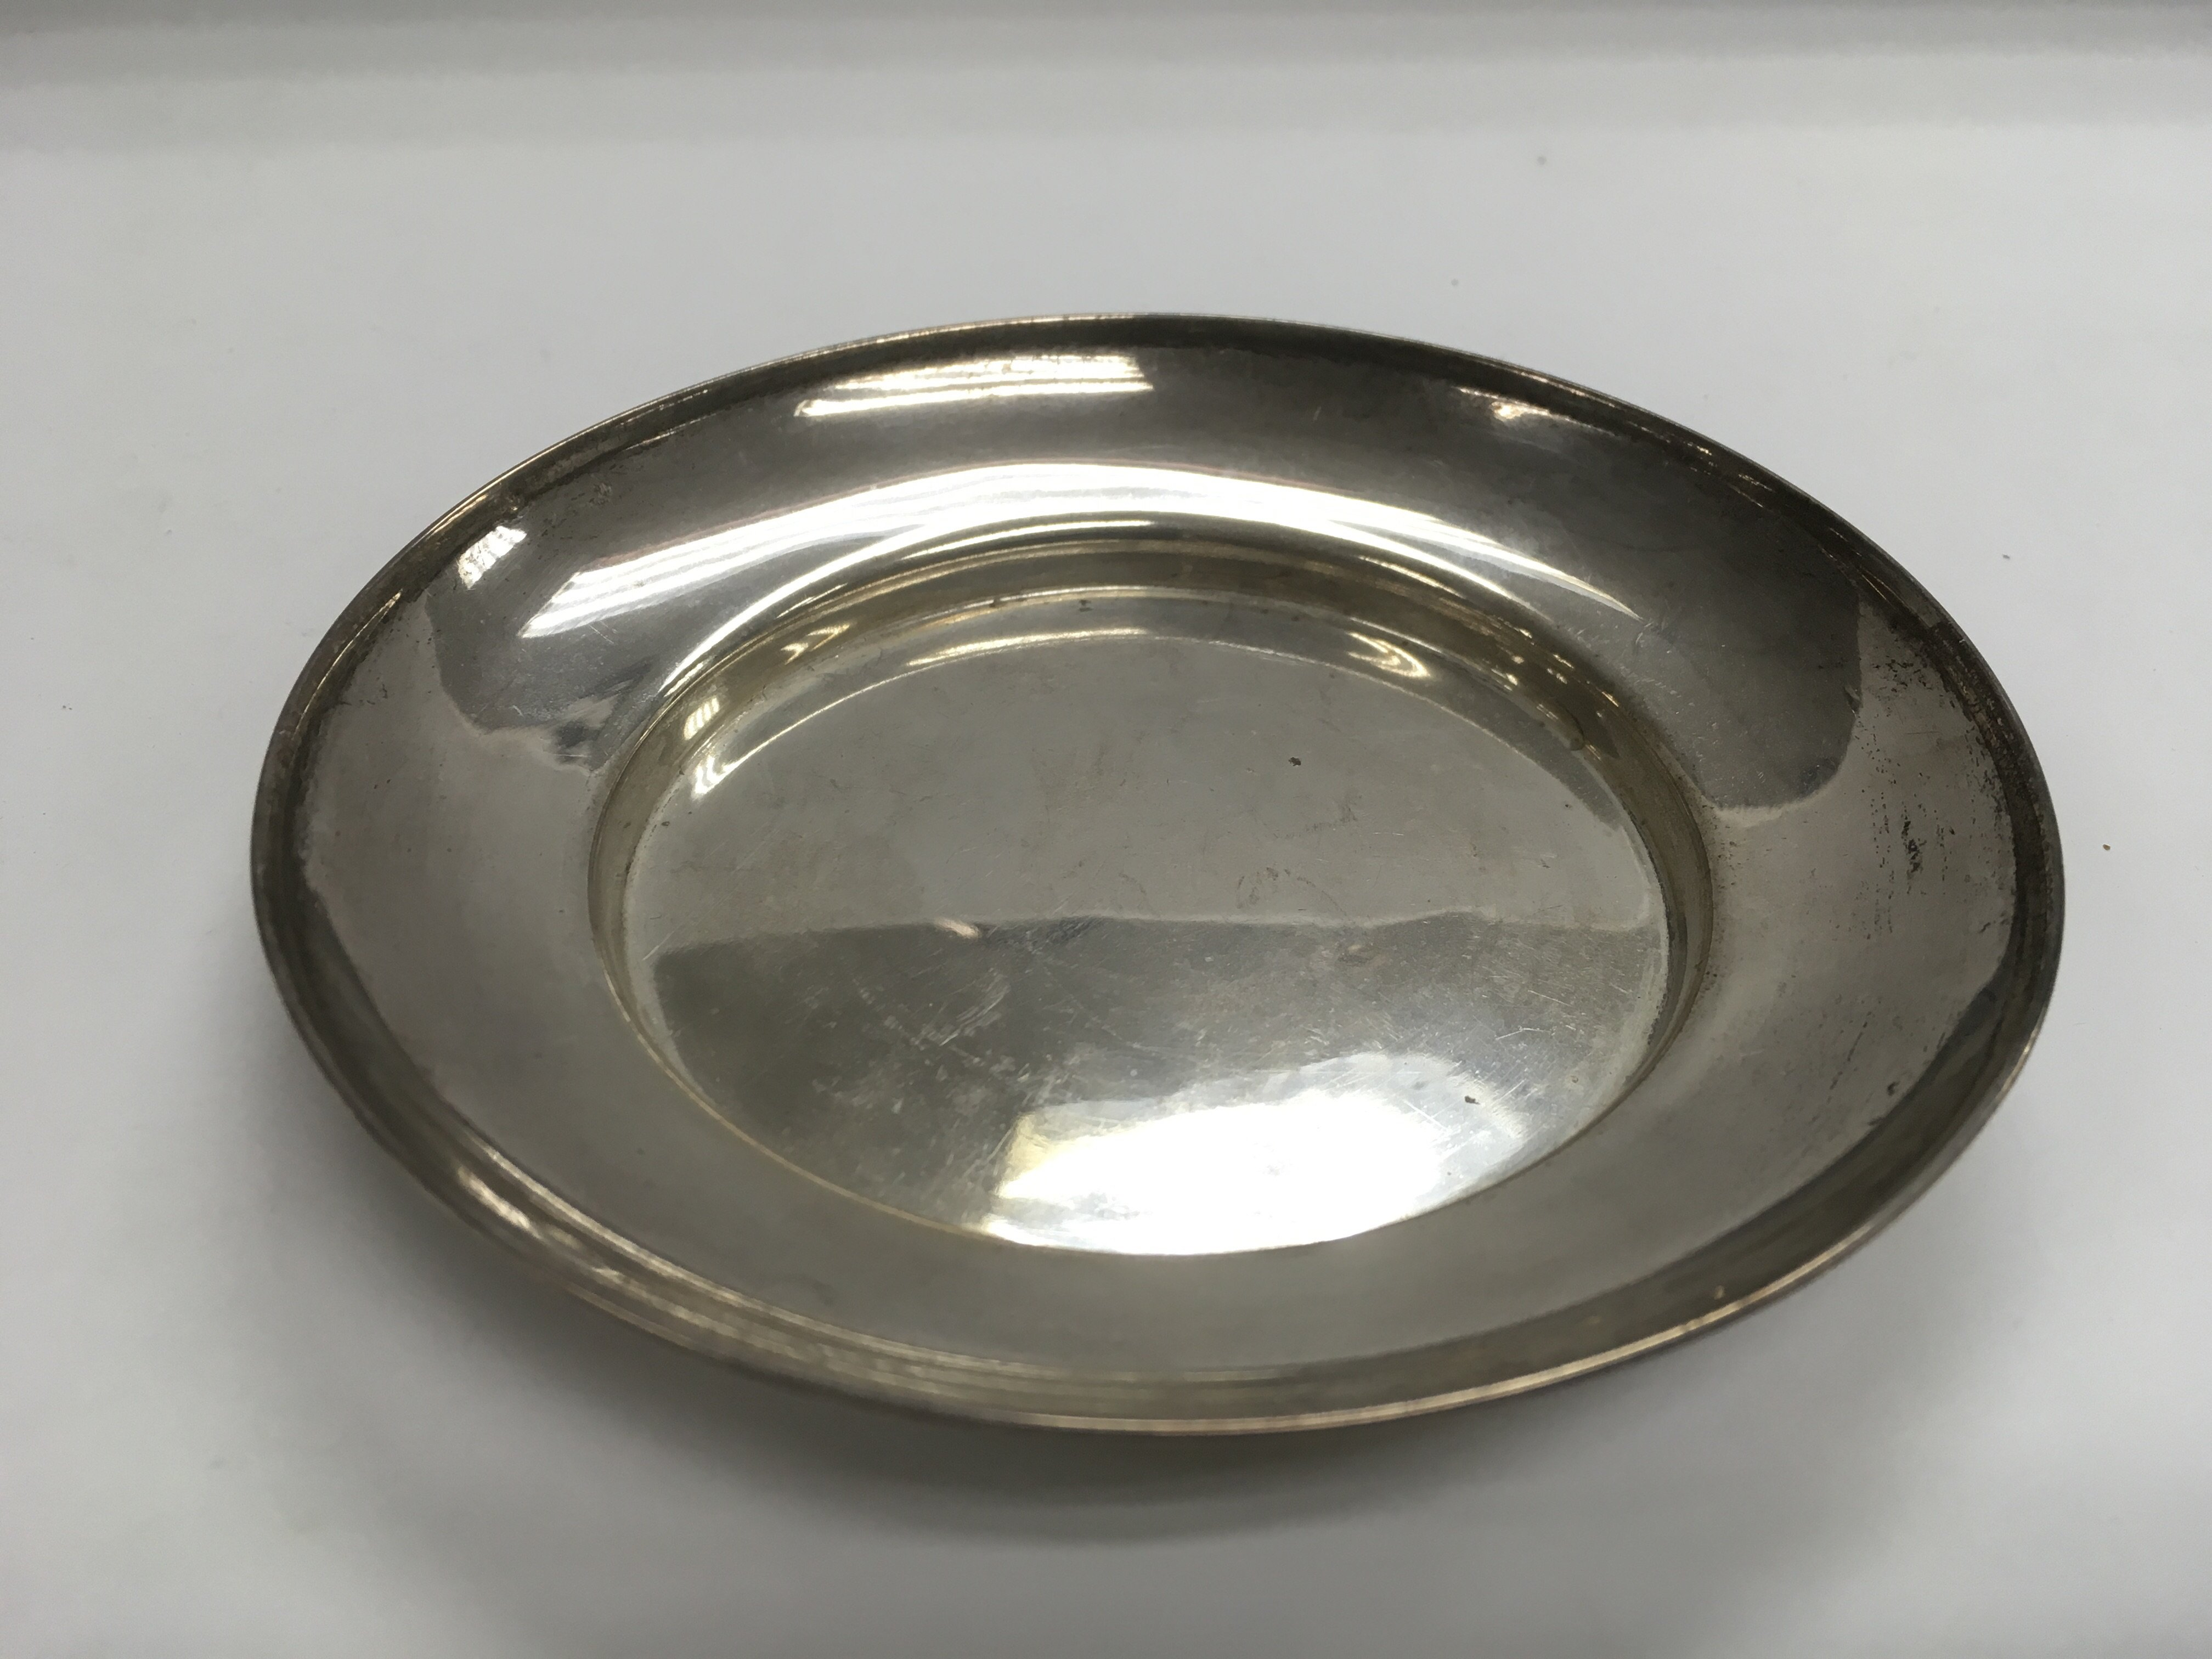 Lot 310 - A circular silver dish, London hallmarks, approx d